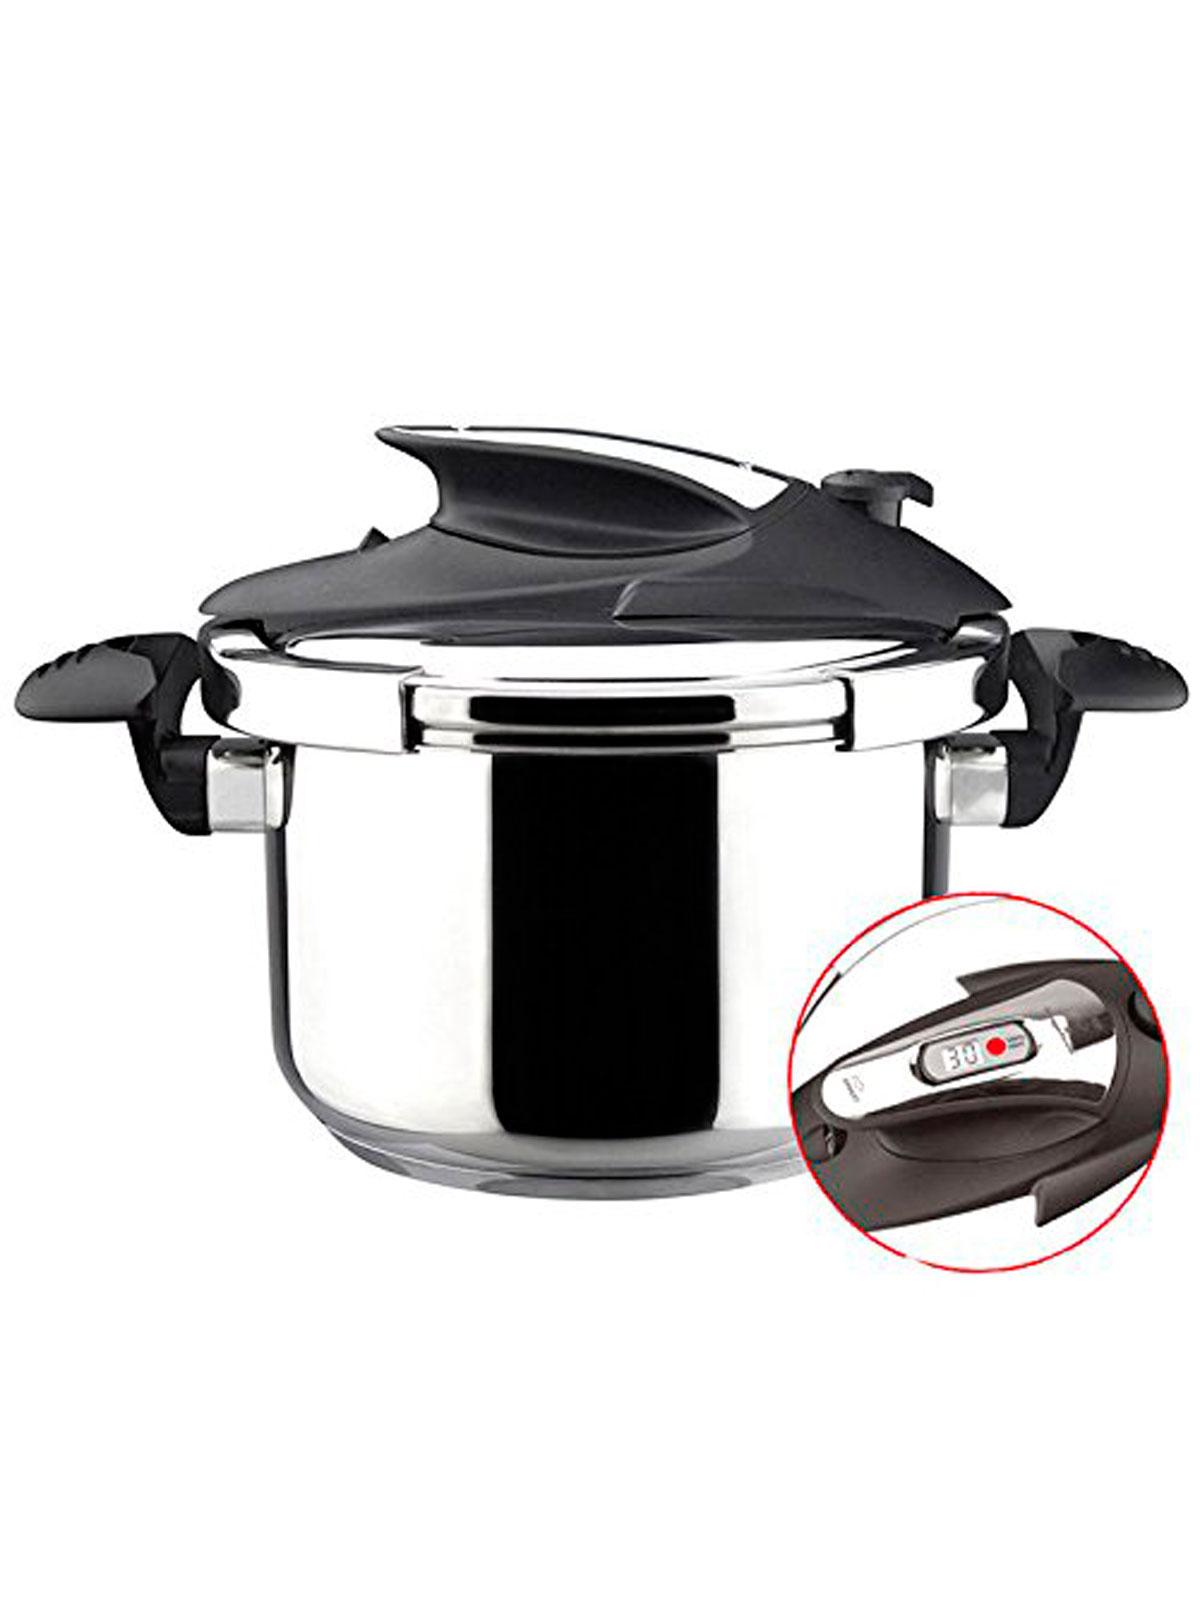 Olla express nova pro 4l 4 magefesa menajeando utensilios for Menaje cocina online